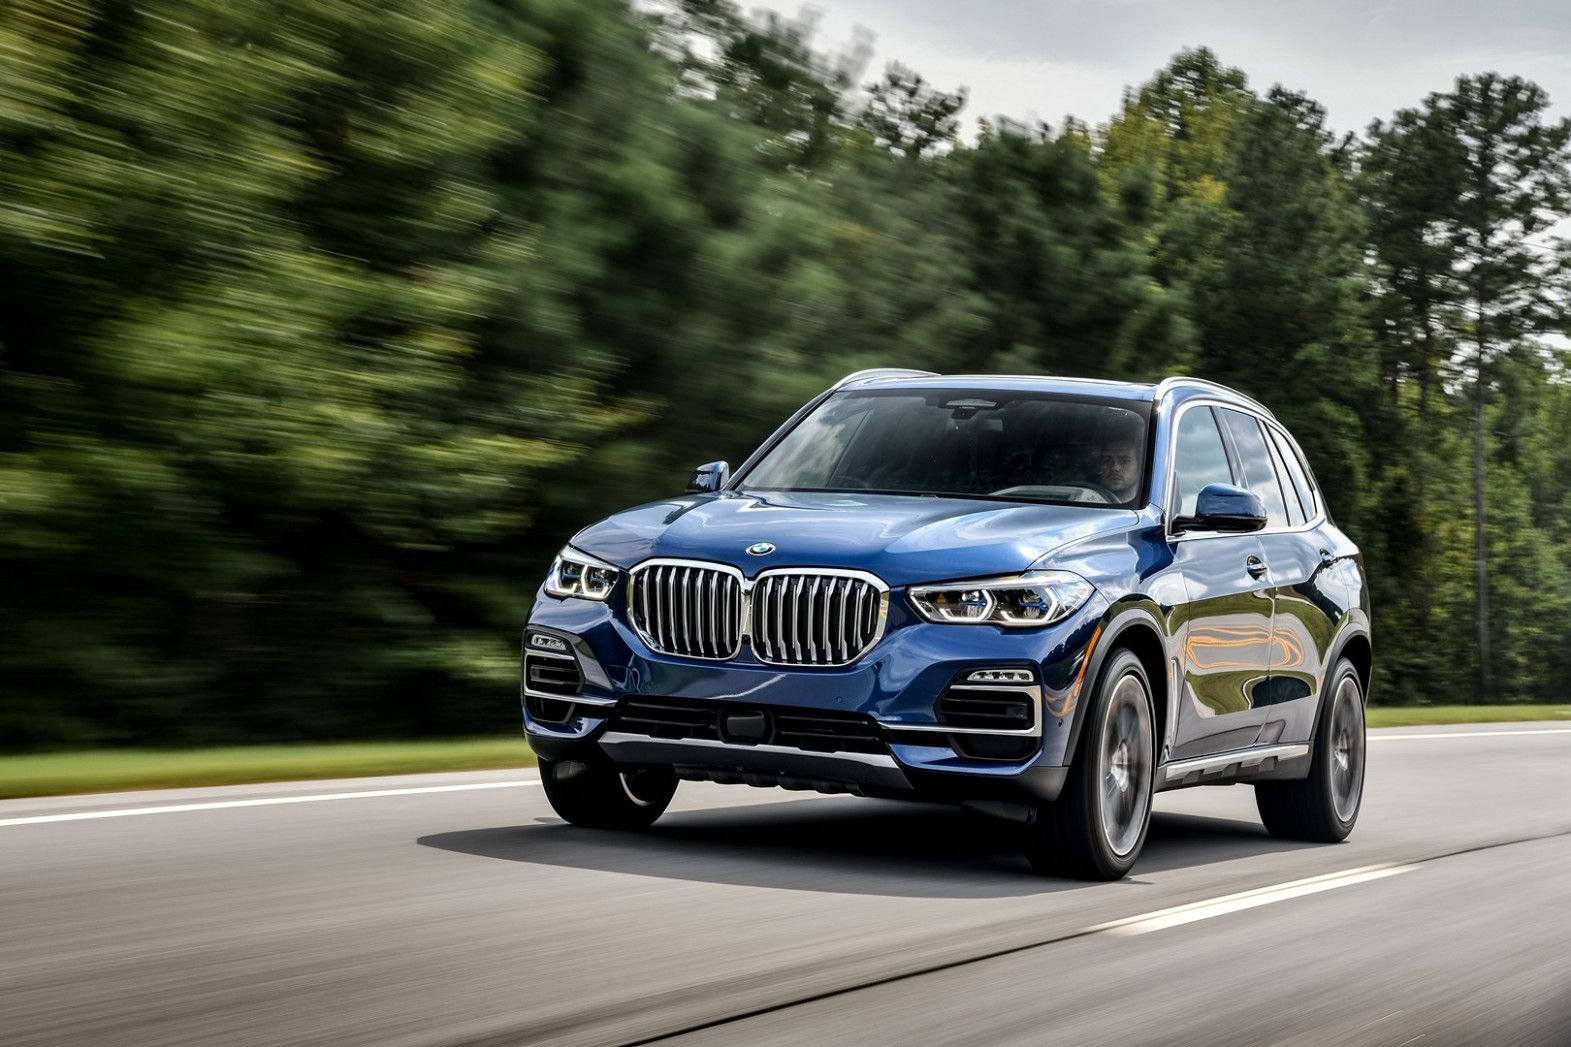 New Bmw X5 Hybrid 2020 Prices Di 2020